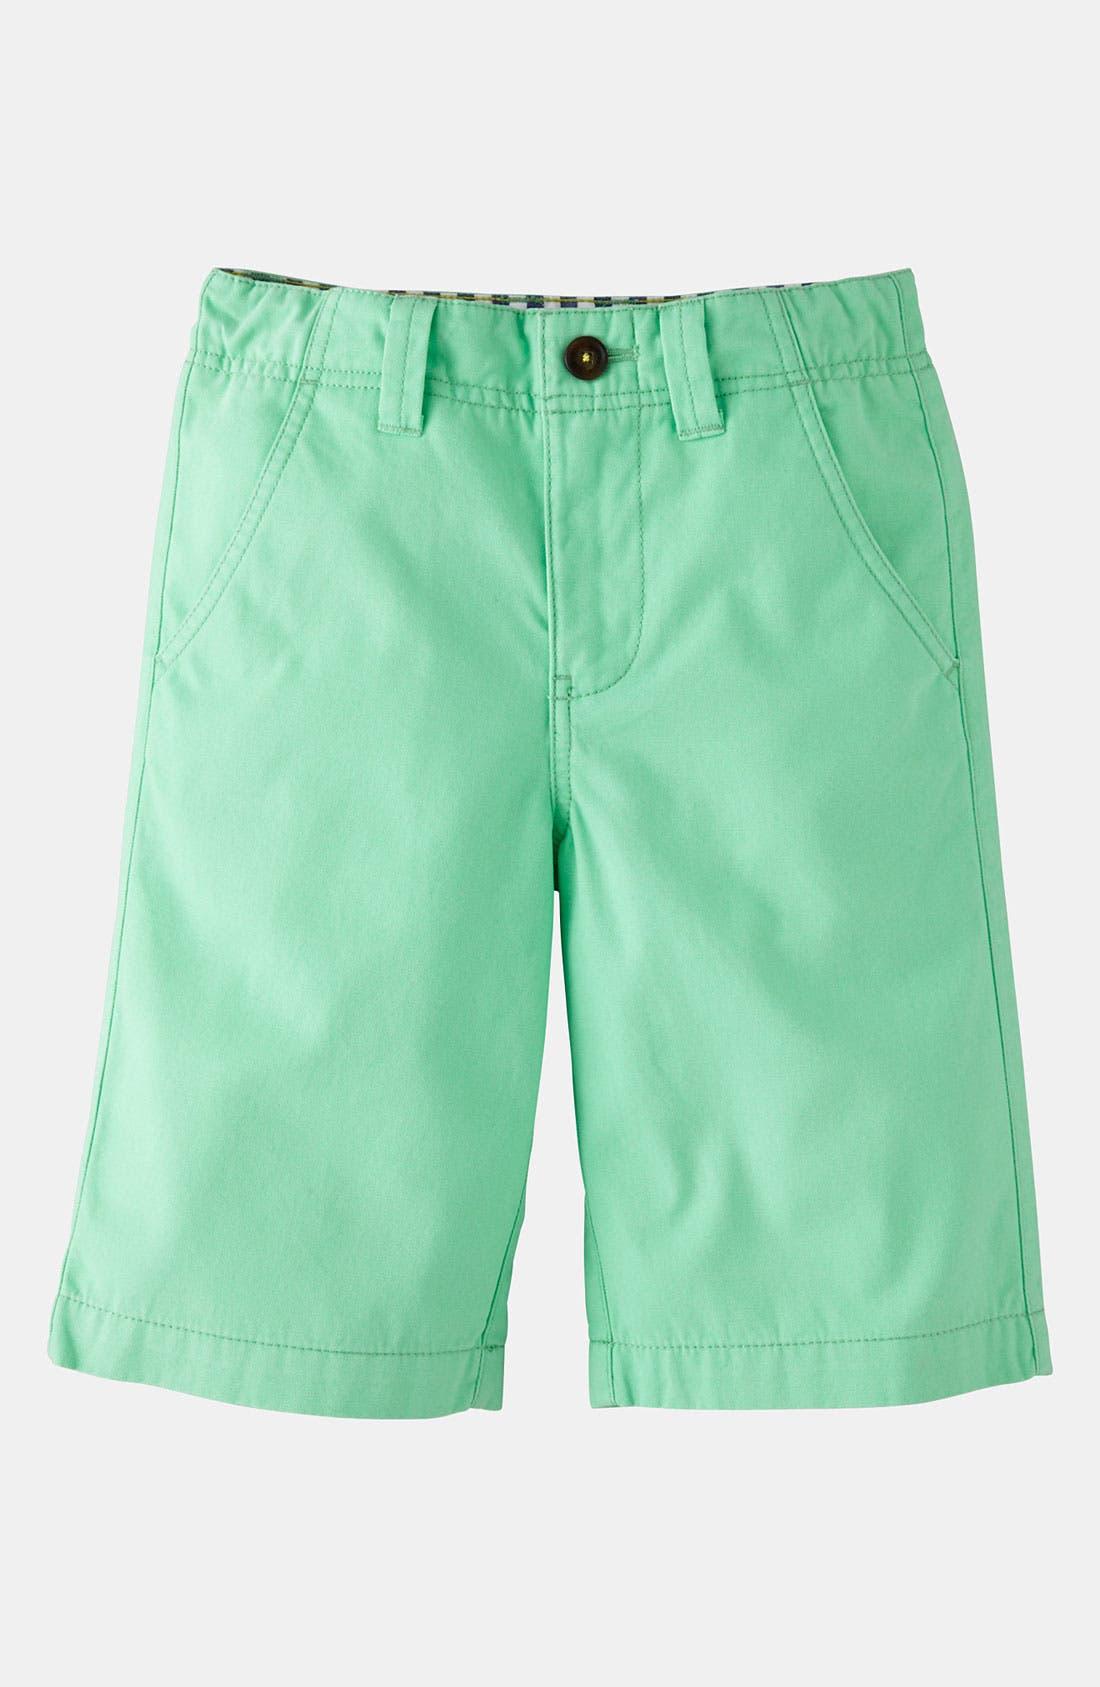 Main Image - Mini Boden 'Deck' Shorts (Toddler, Little Boys & Big Boys)